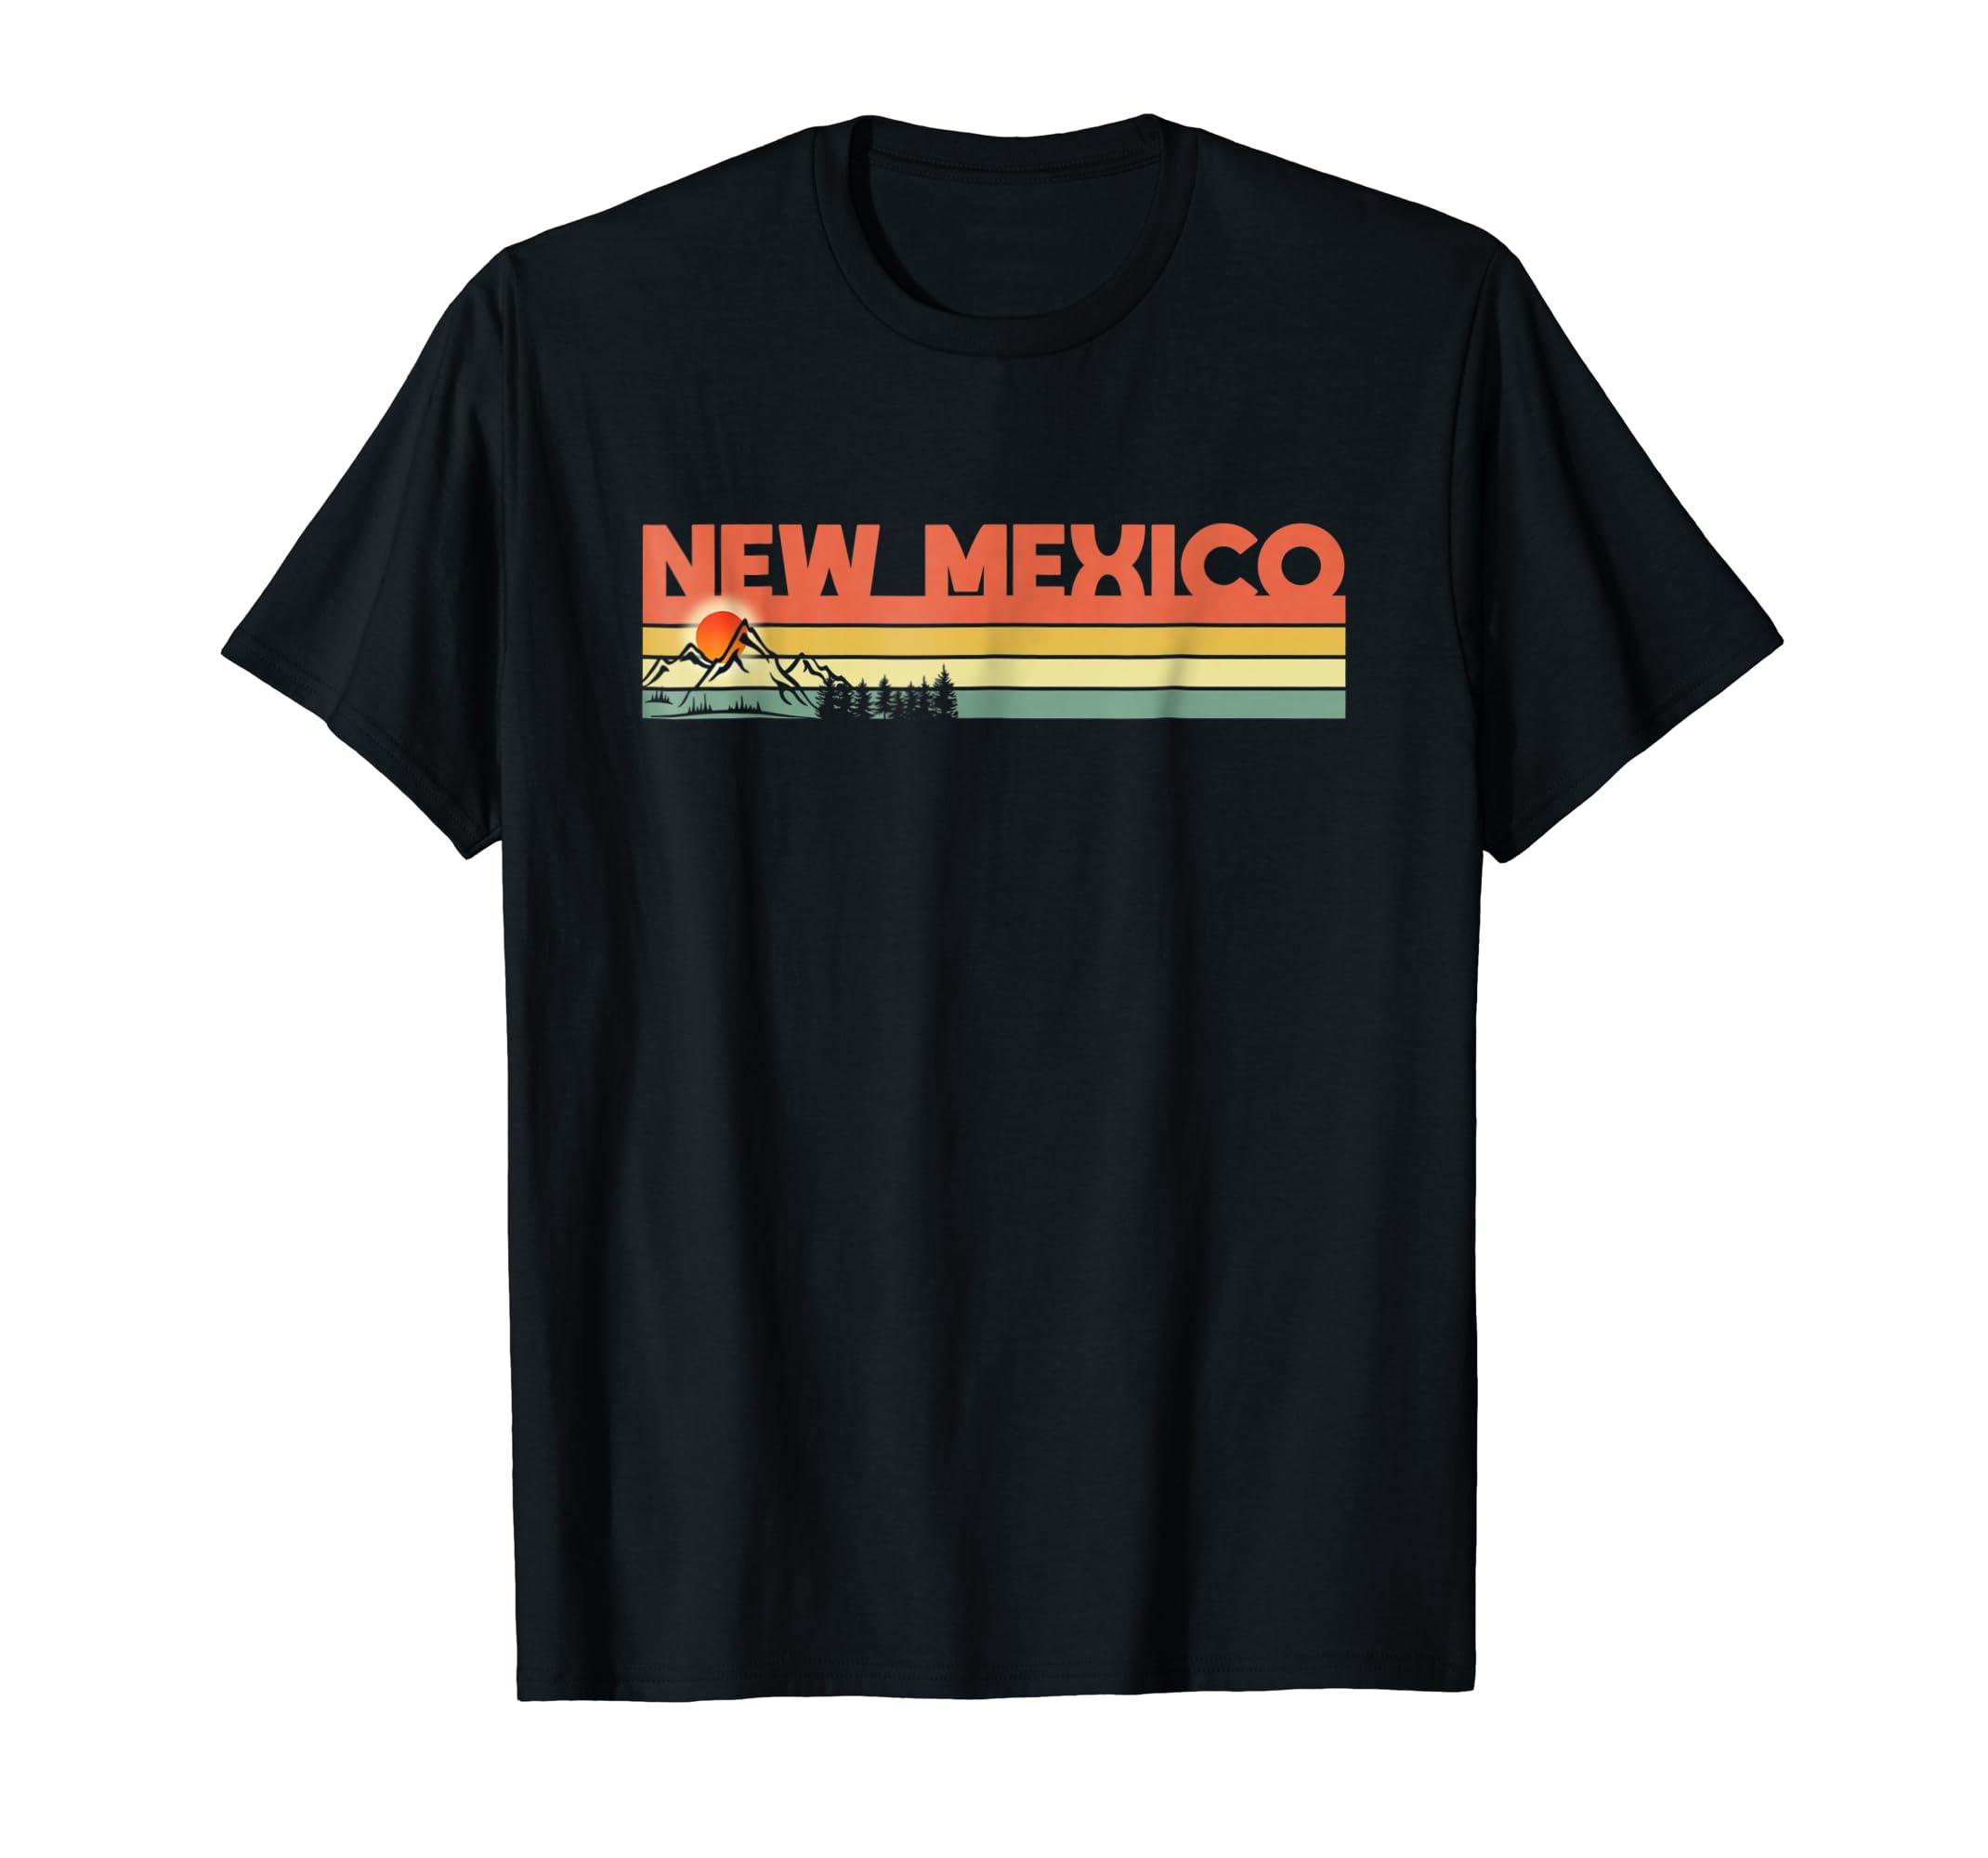 31a5a2da9 Cheap Vintage Graphic T Shirts | Top Mode Depot